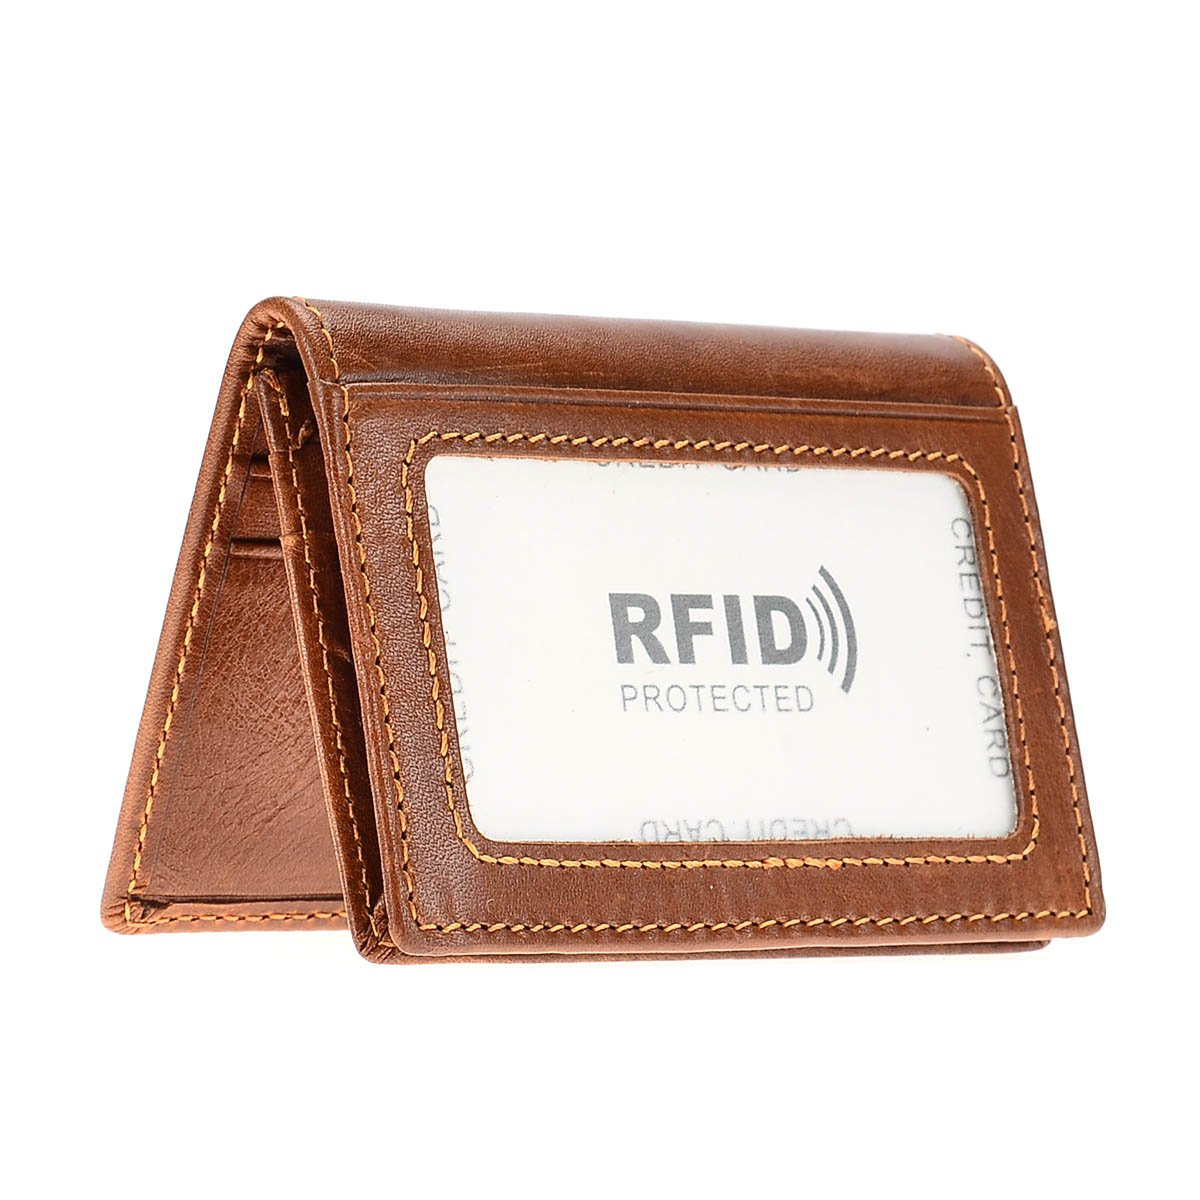 HAWEE Men's Bifold Front Pocket Wallet Genuine Leather RFID Blocking Card Billfold HW-CSAX06031Coffee